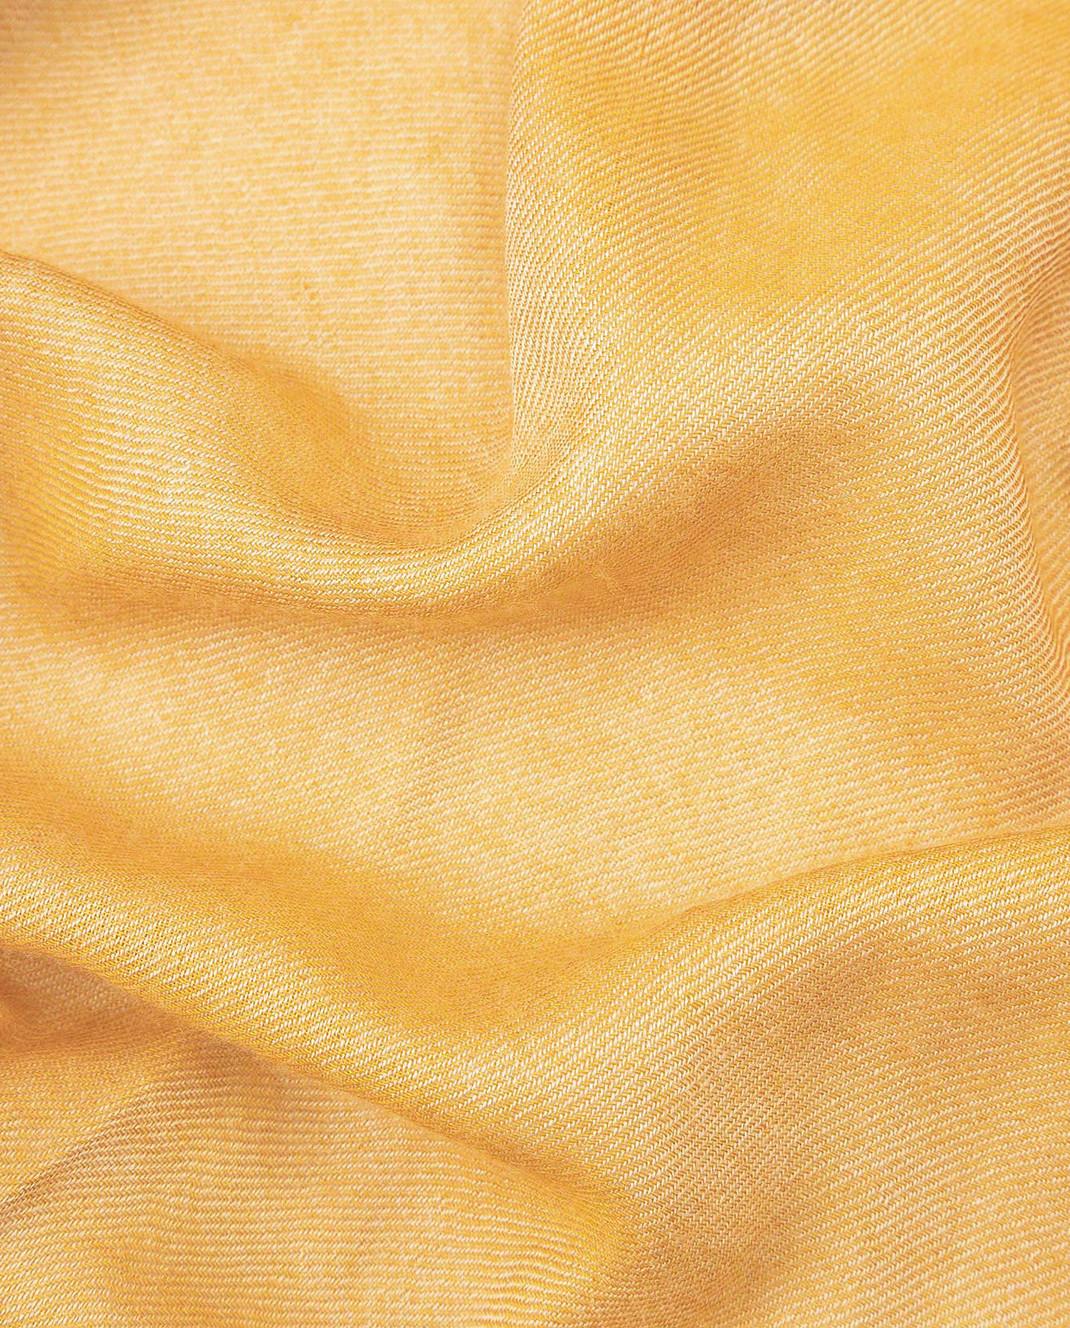 Bertolo Cashmere Желтый шарф из кашемира и шелка 000238 изображение 3